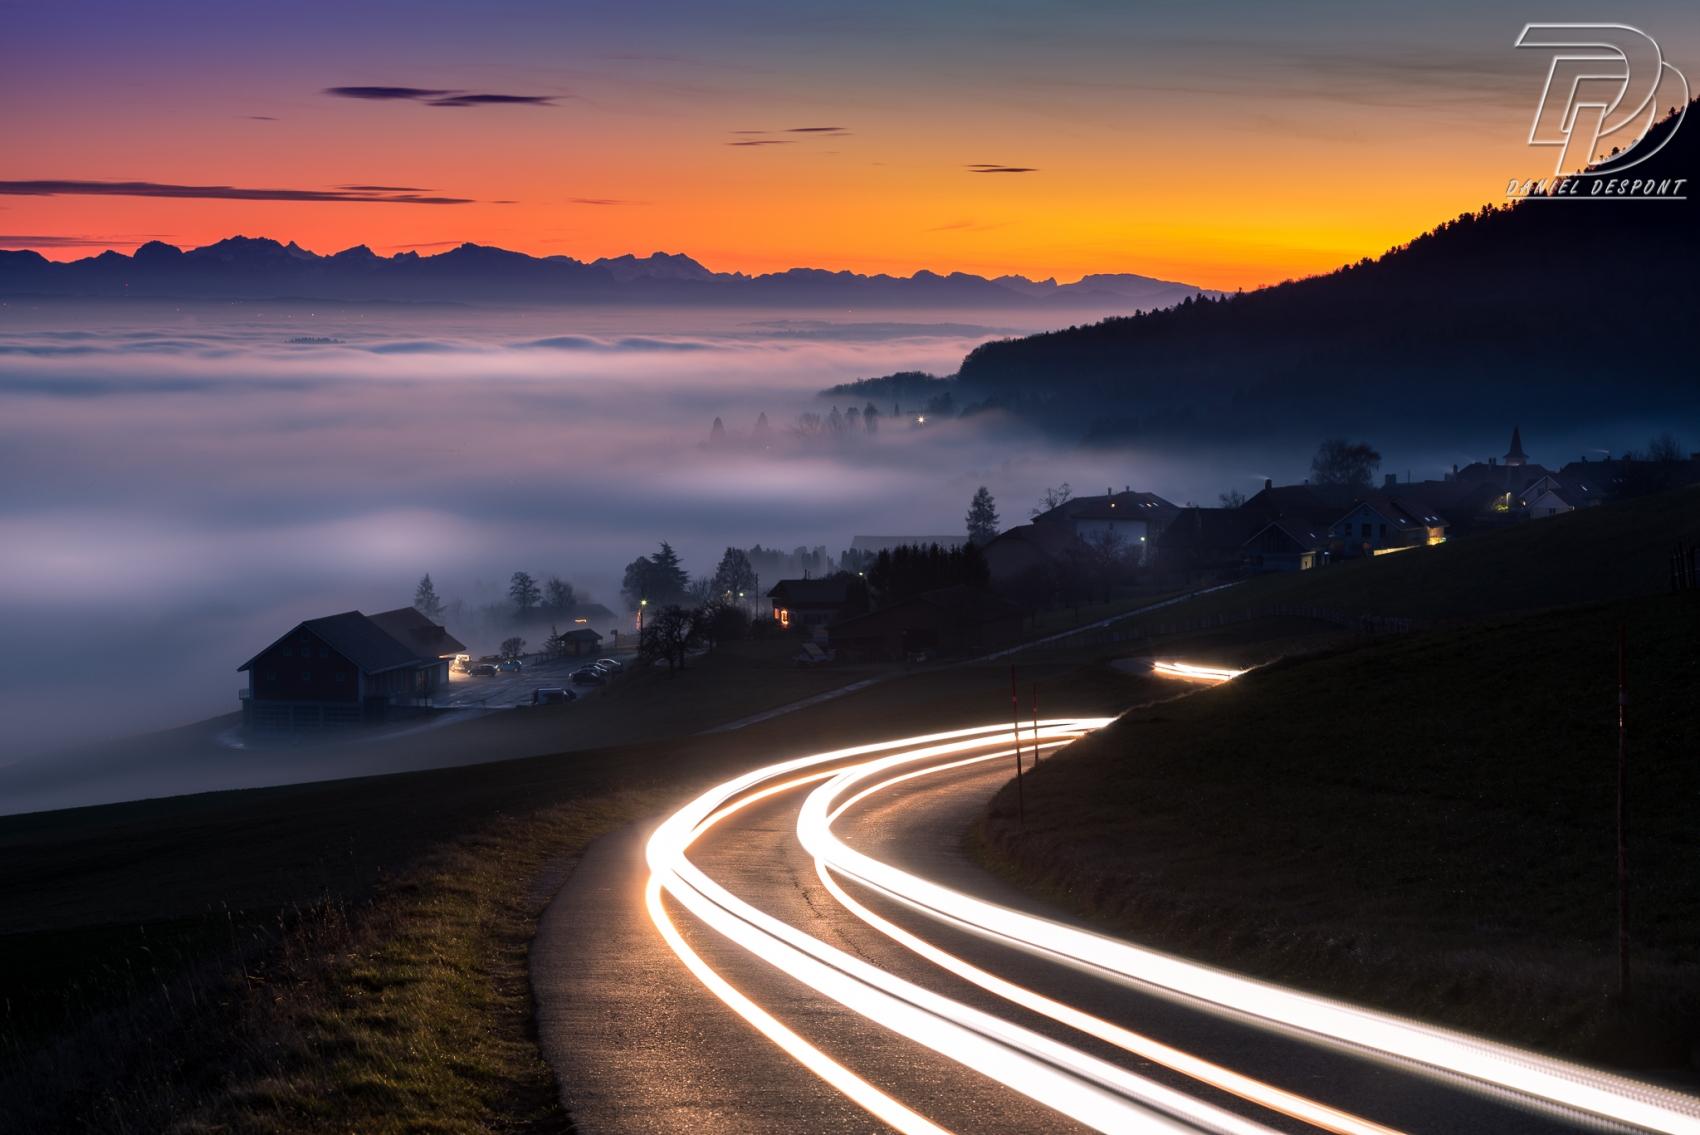 En route vers le brouillard, NE